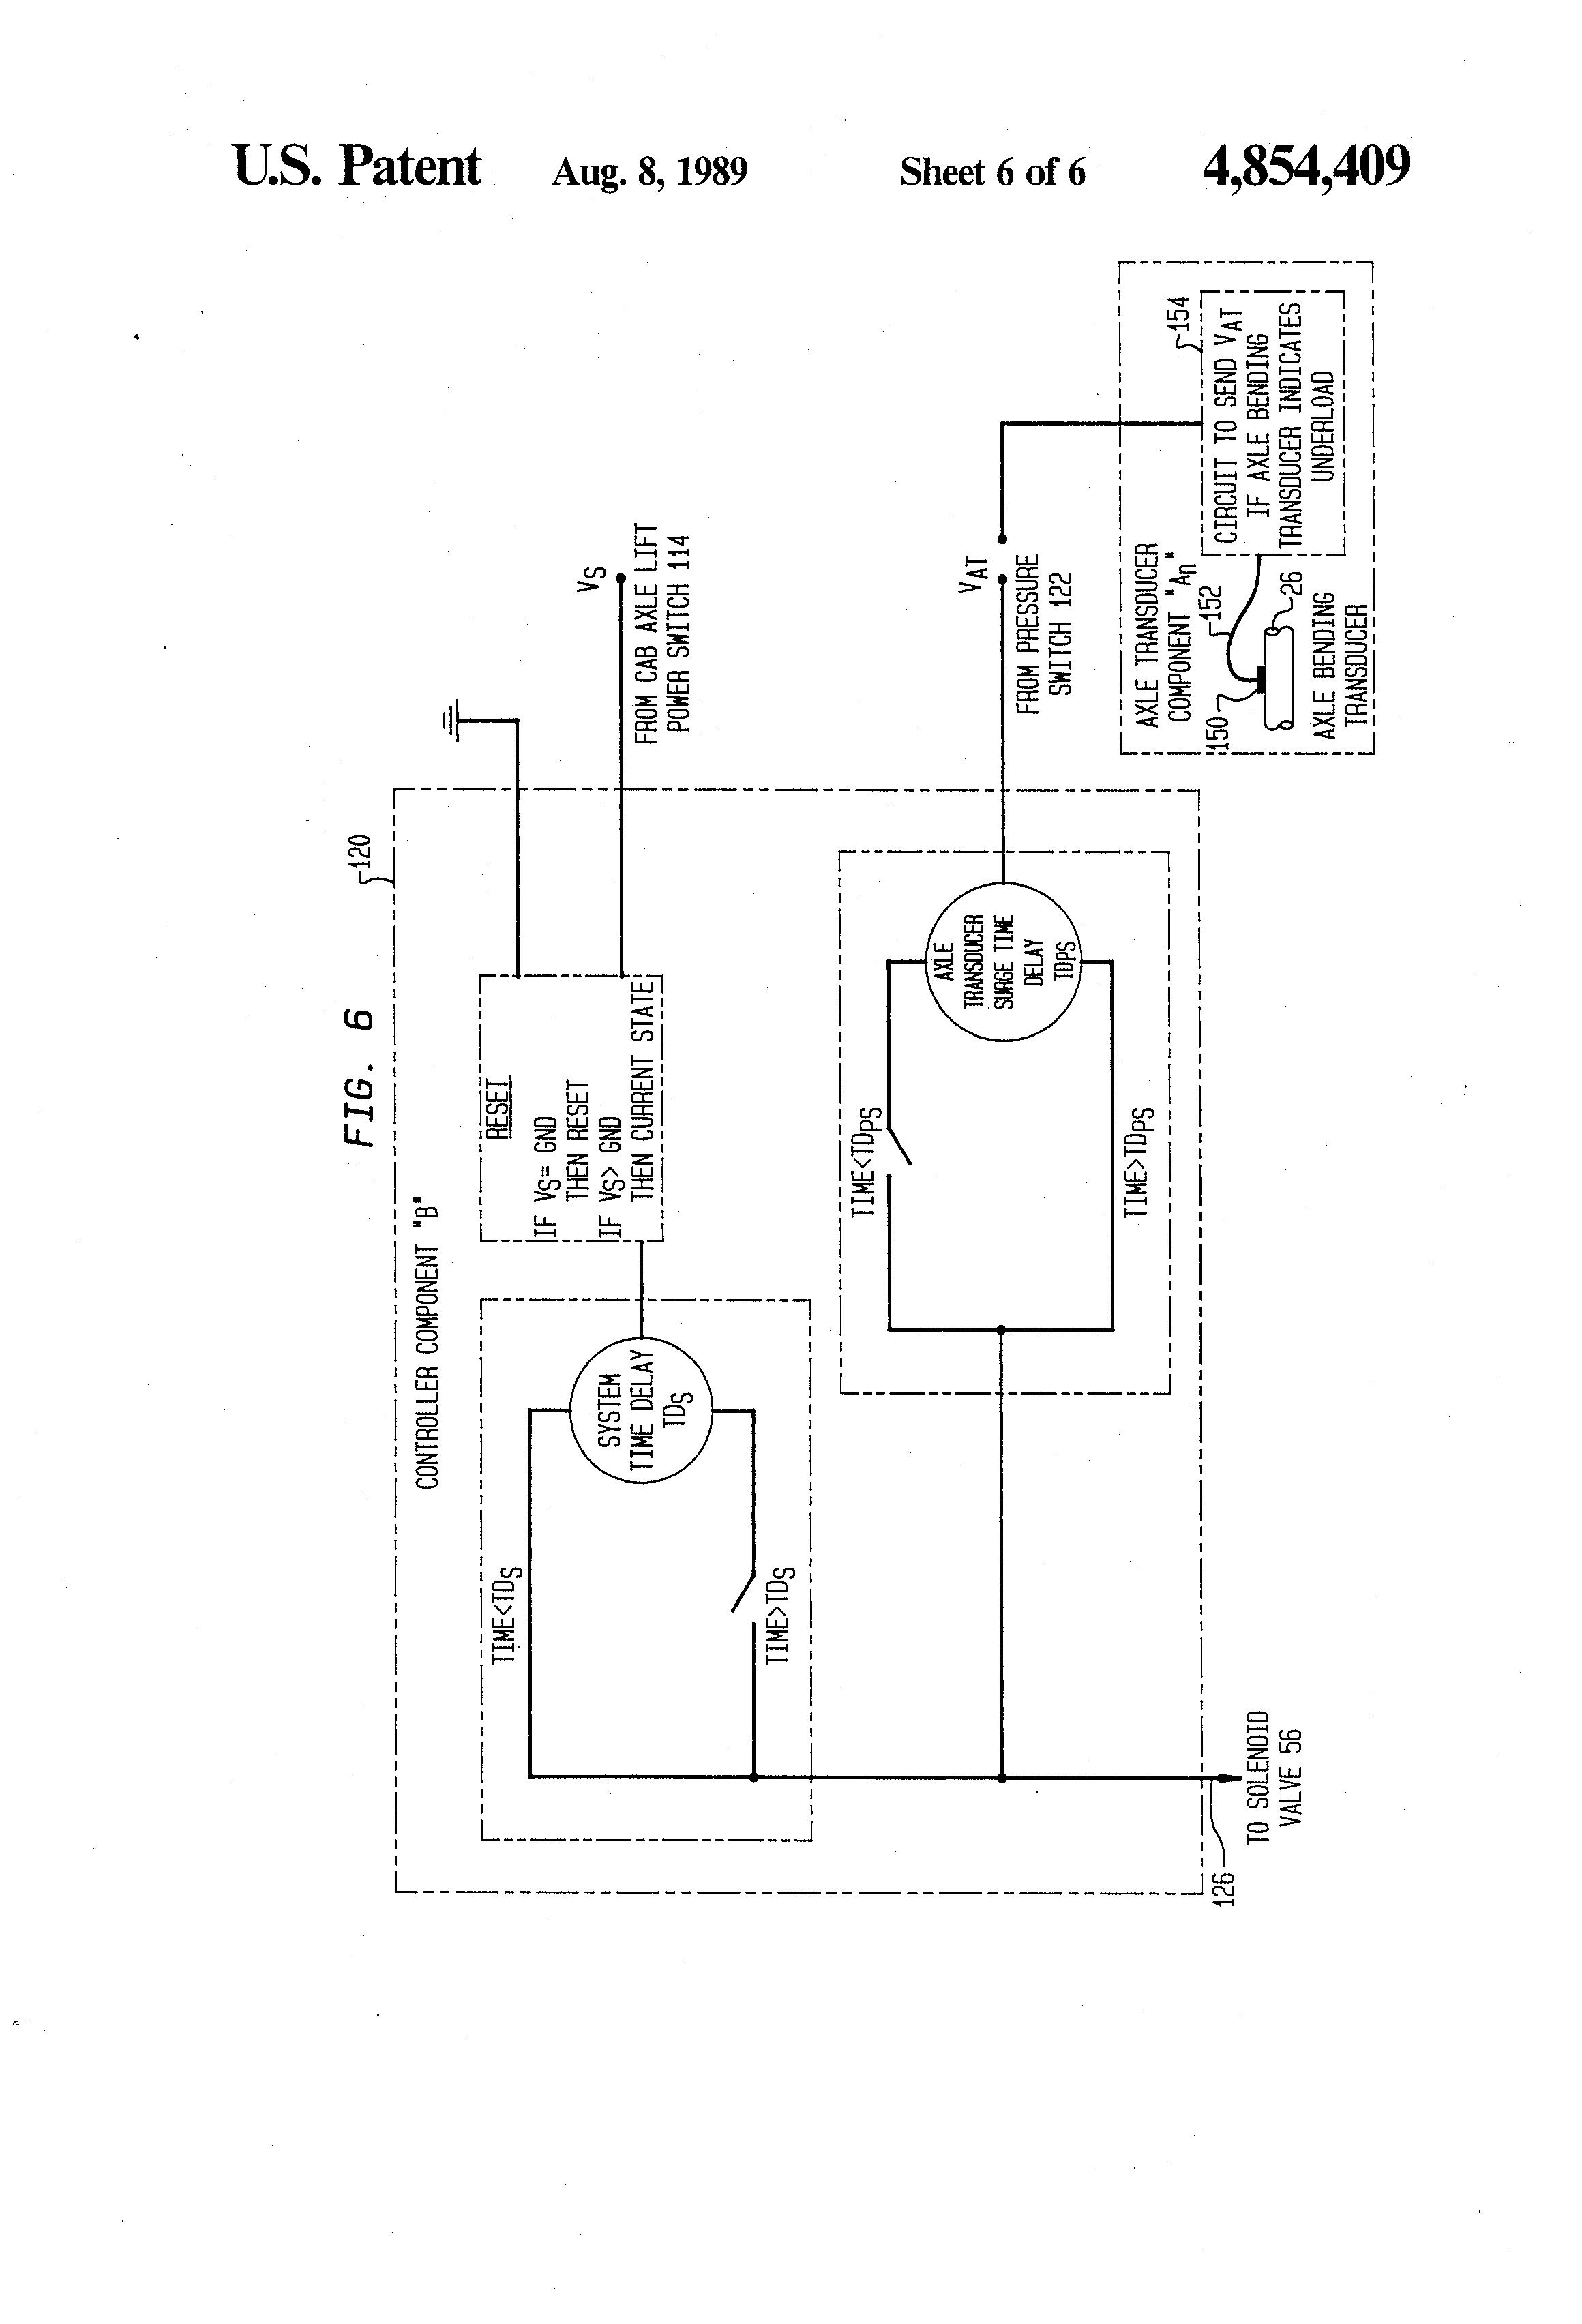 Air Ride Plumbing Diagram - Wiring Schematics Air Suspension Switch Wiring Diagram on